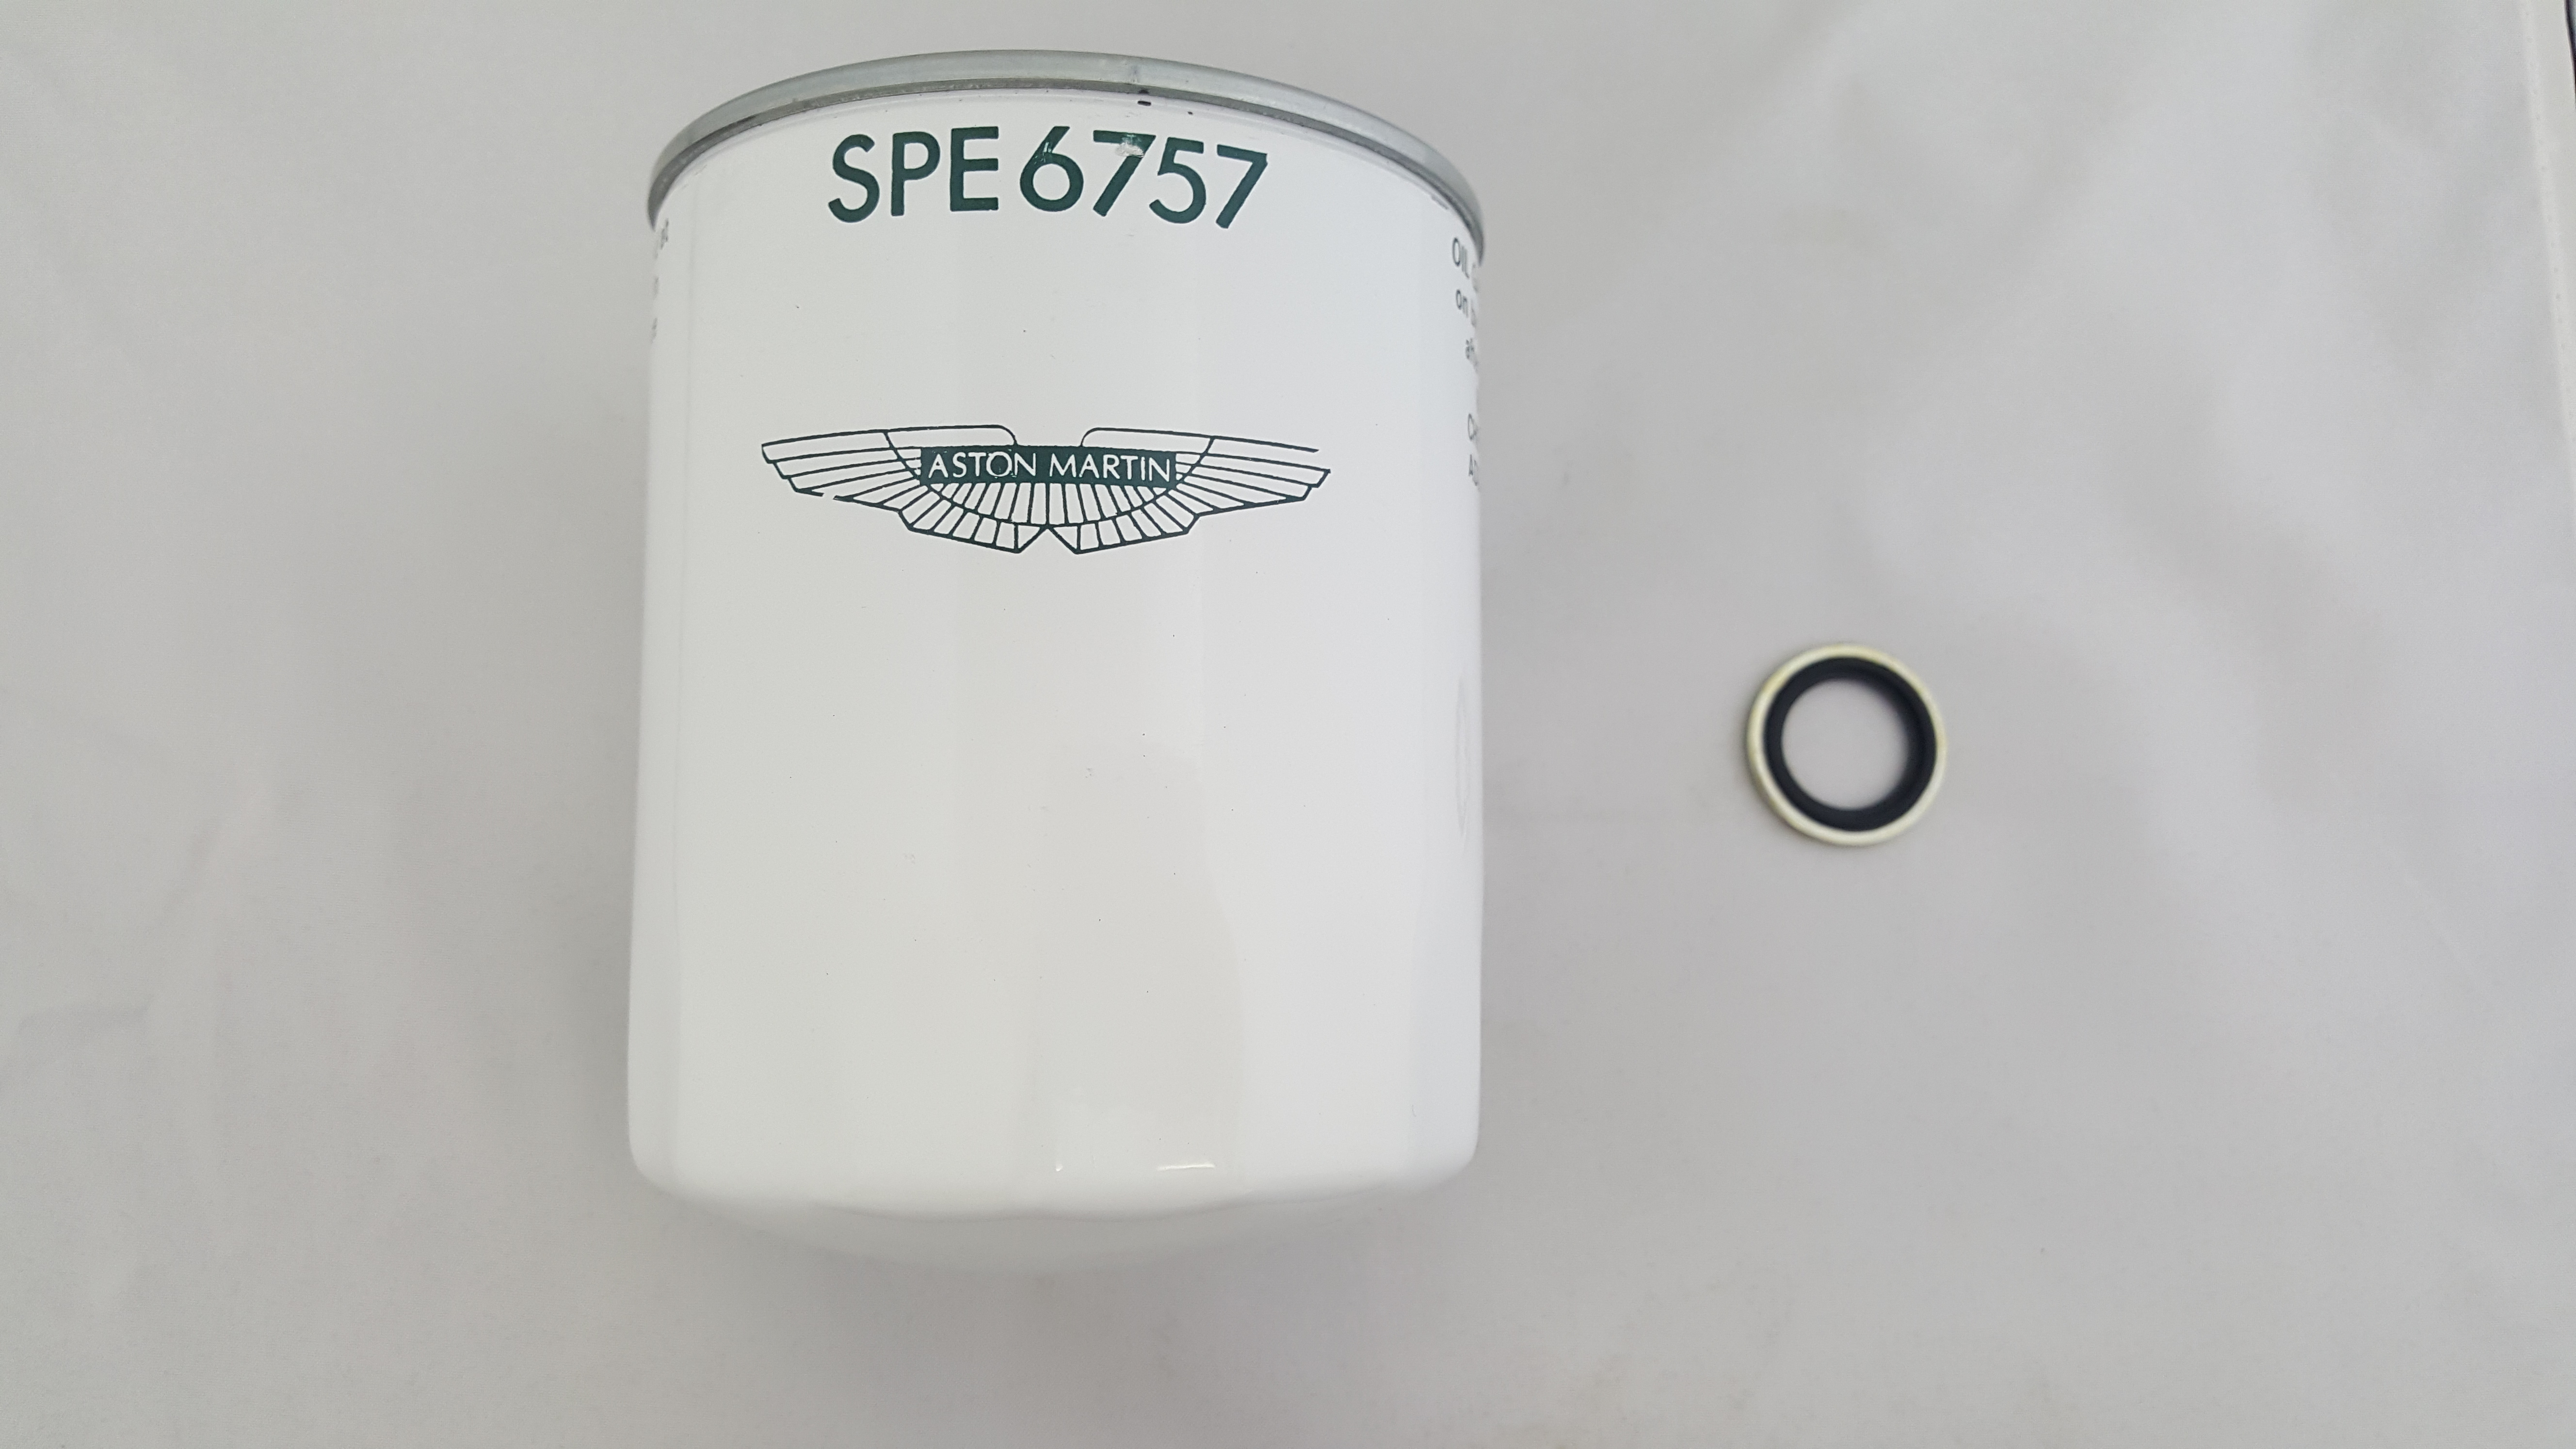 Aston Martin DB7 & DB7 Volante - 6 cylinder Oil Filter Kit